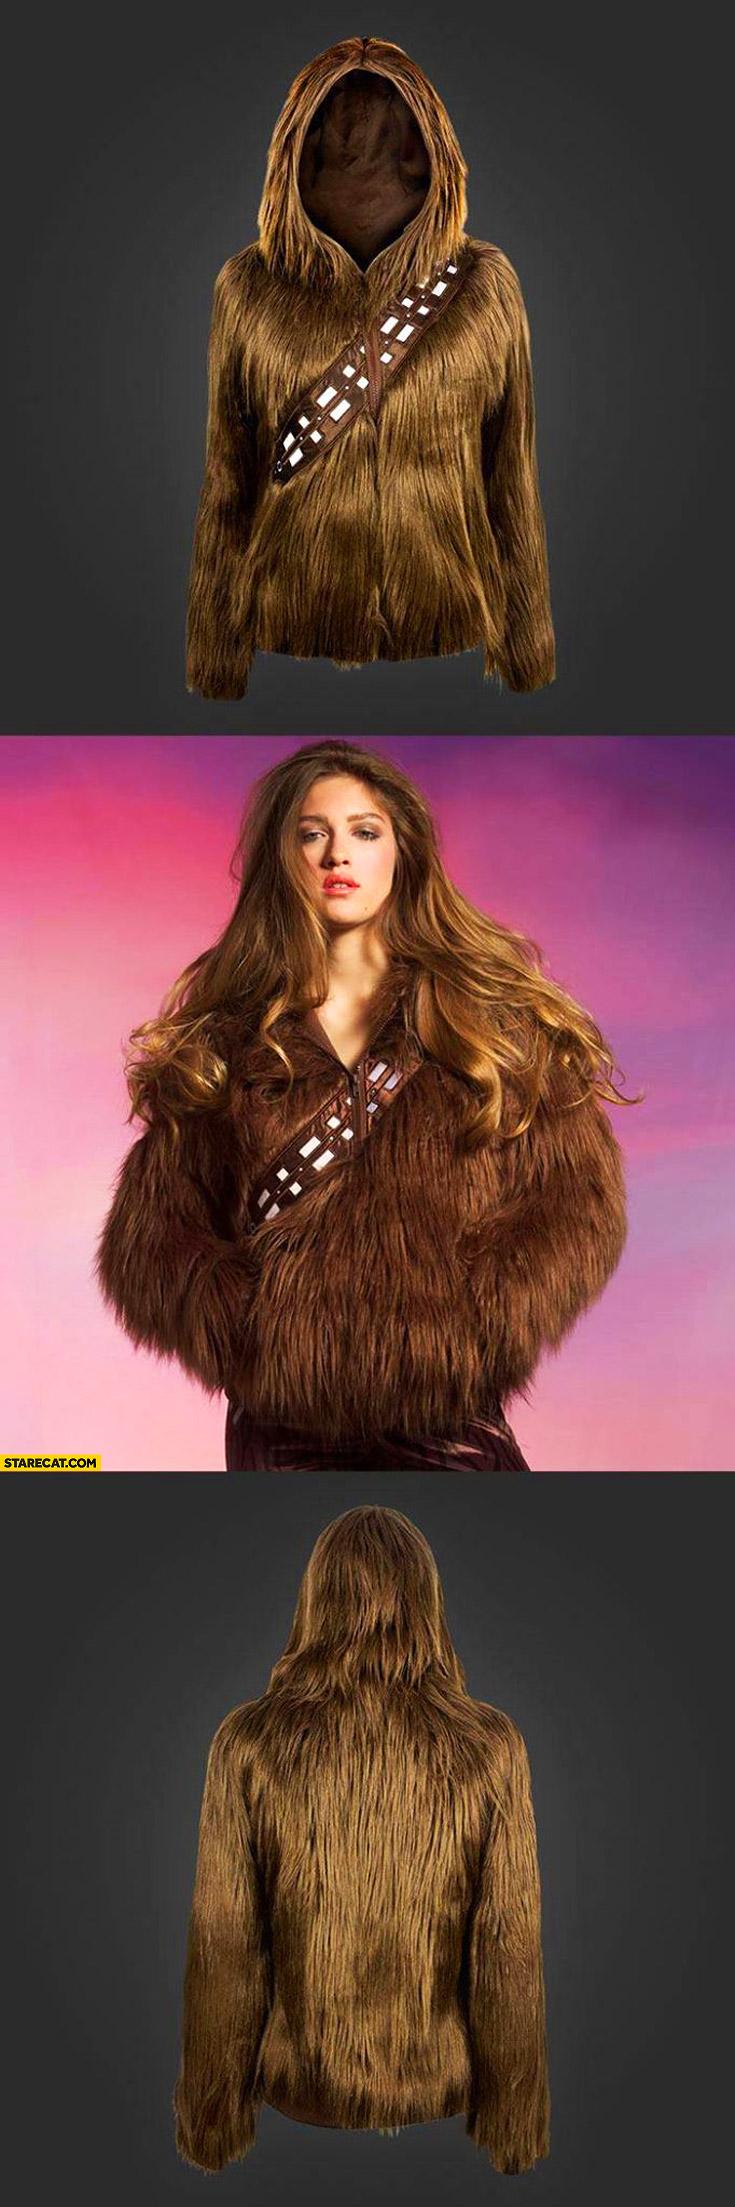 Chewbacca fur woman's jacket